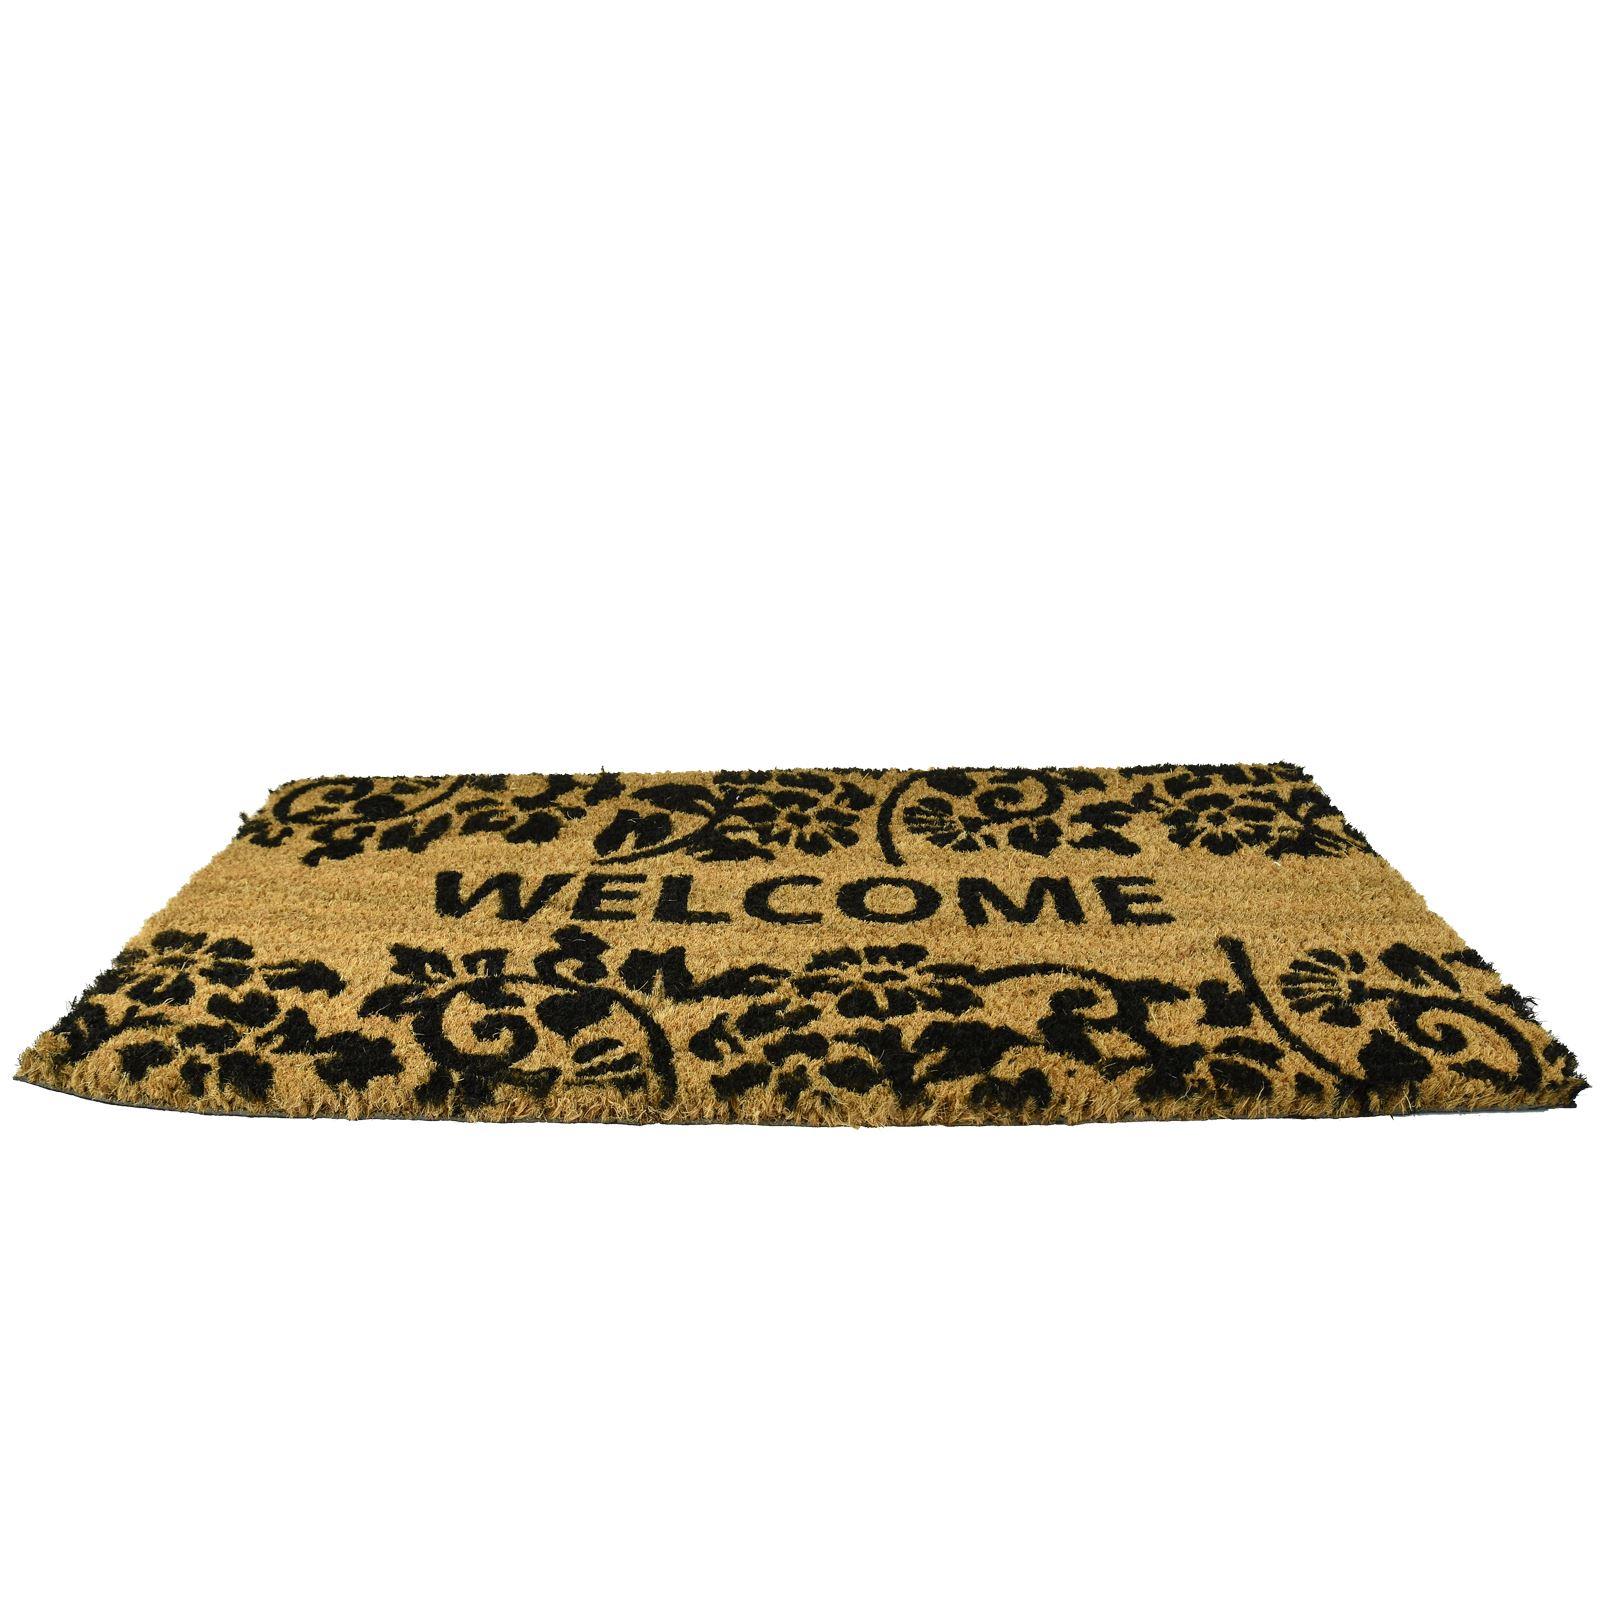 Plain-Non-Slip-Door-Mat-Tough-Natural-Coir-PVC-Back-Welcome-Doormat-40-x-60cm miniatura 18